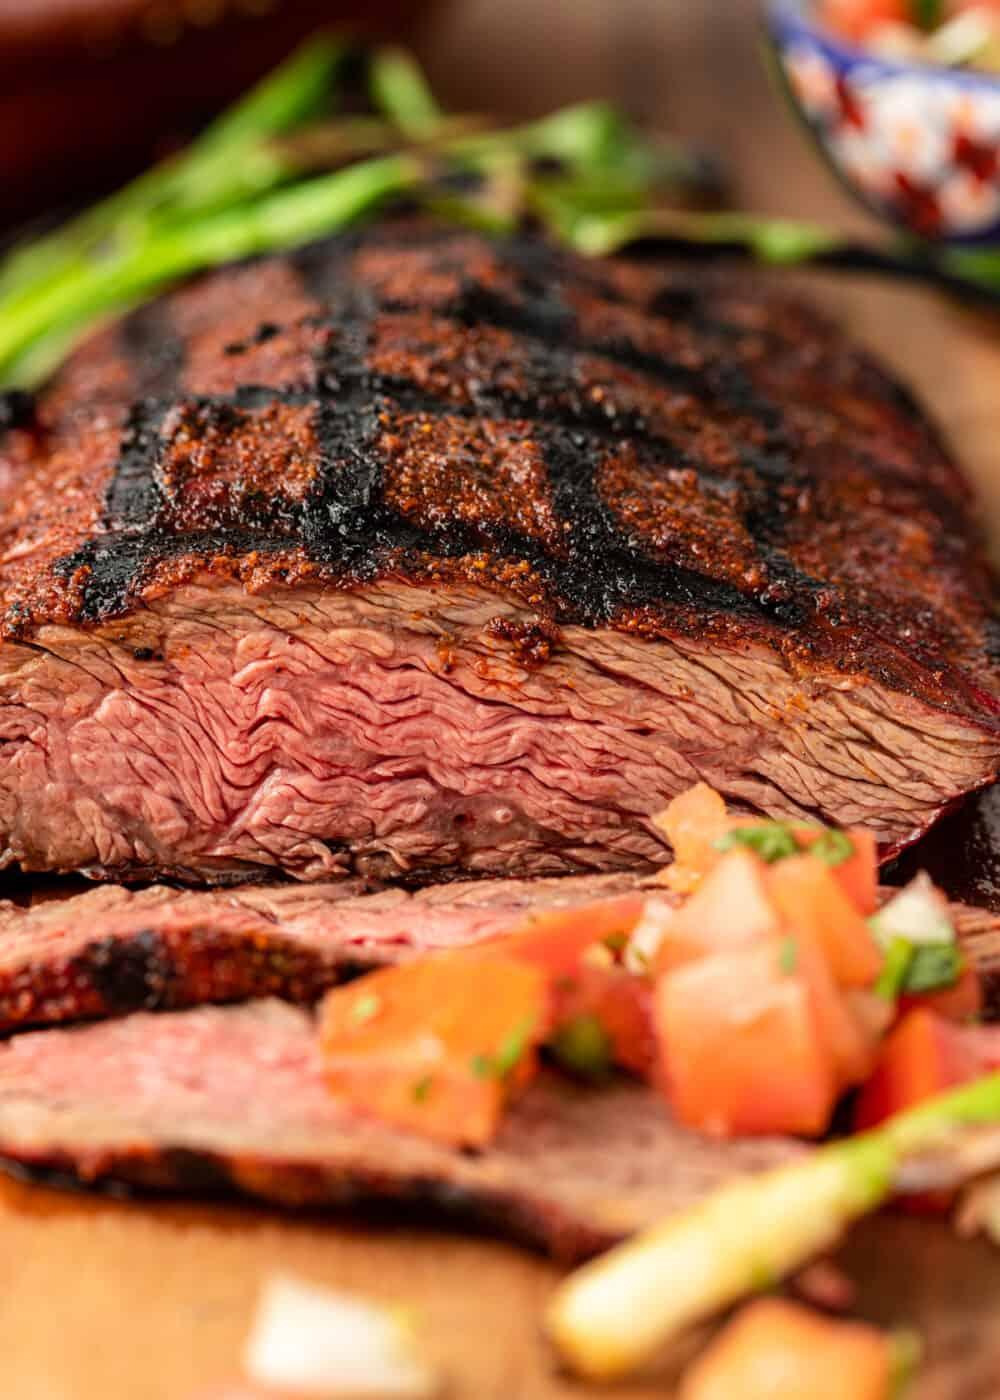 close up image of bavette steak cooked to medium-rare